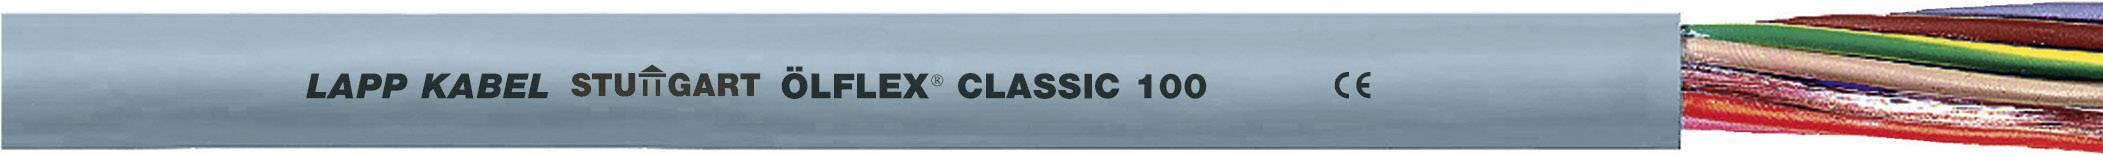 Kabel LappKabel Ölflex CLASSIC 100 7G0,5 (0010005), PVC, 6,7 mm, 500 V, šedá, 1000 m